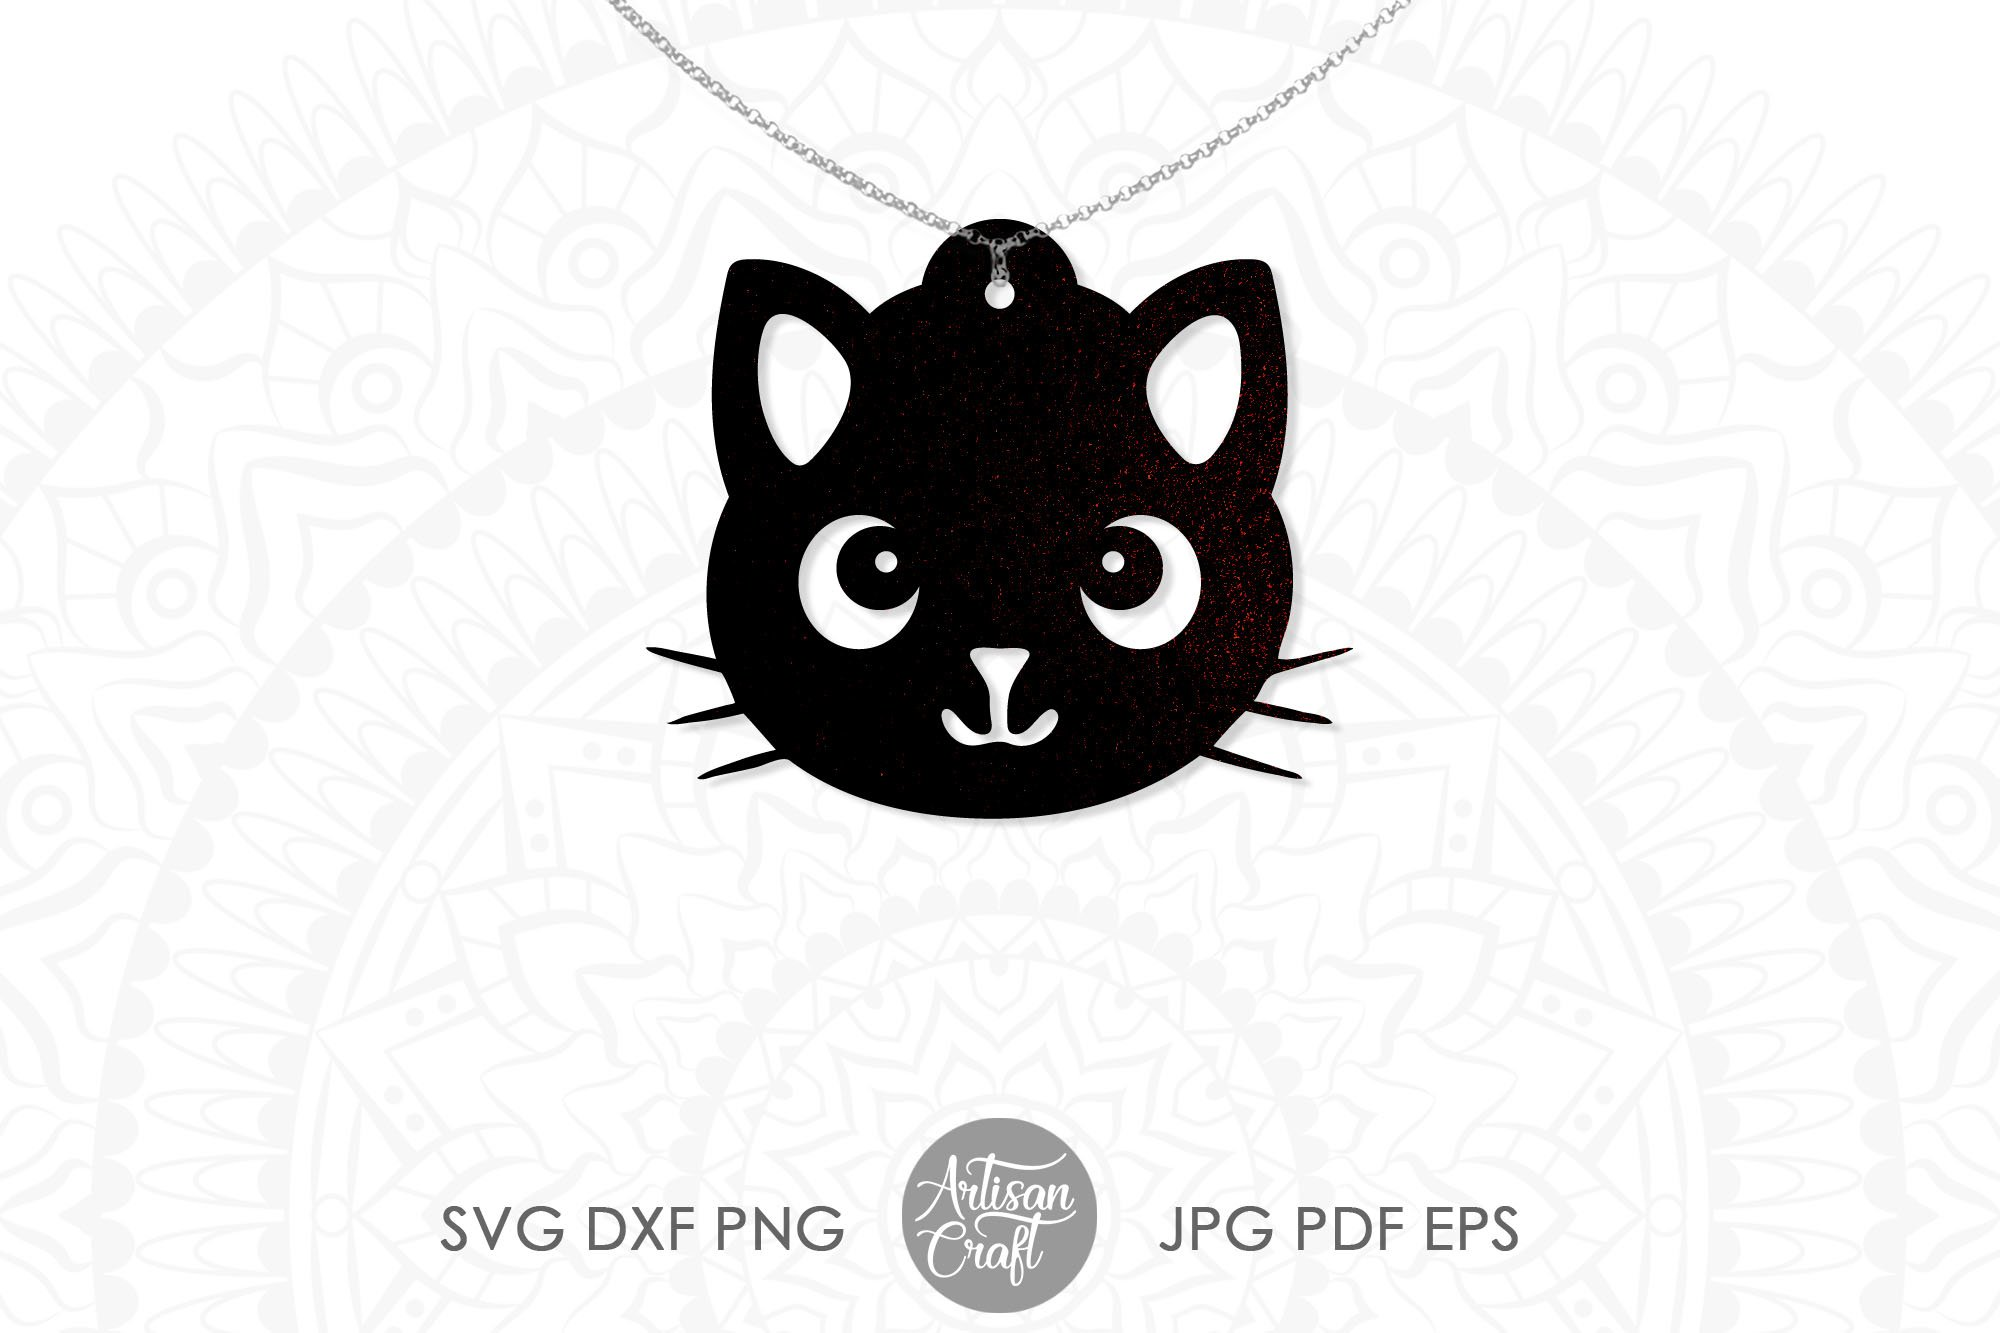 Cat earrings, svg, earrings for kids, cute cat earrings example image 2